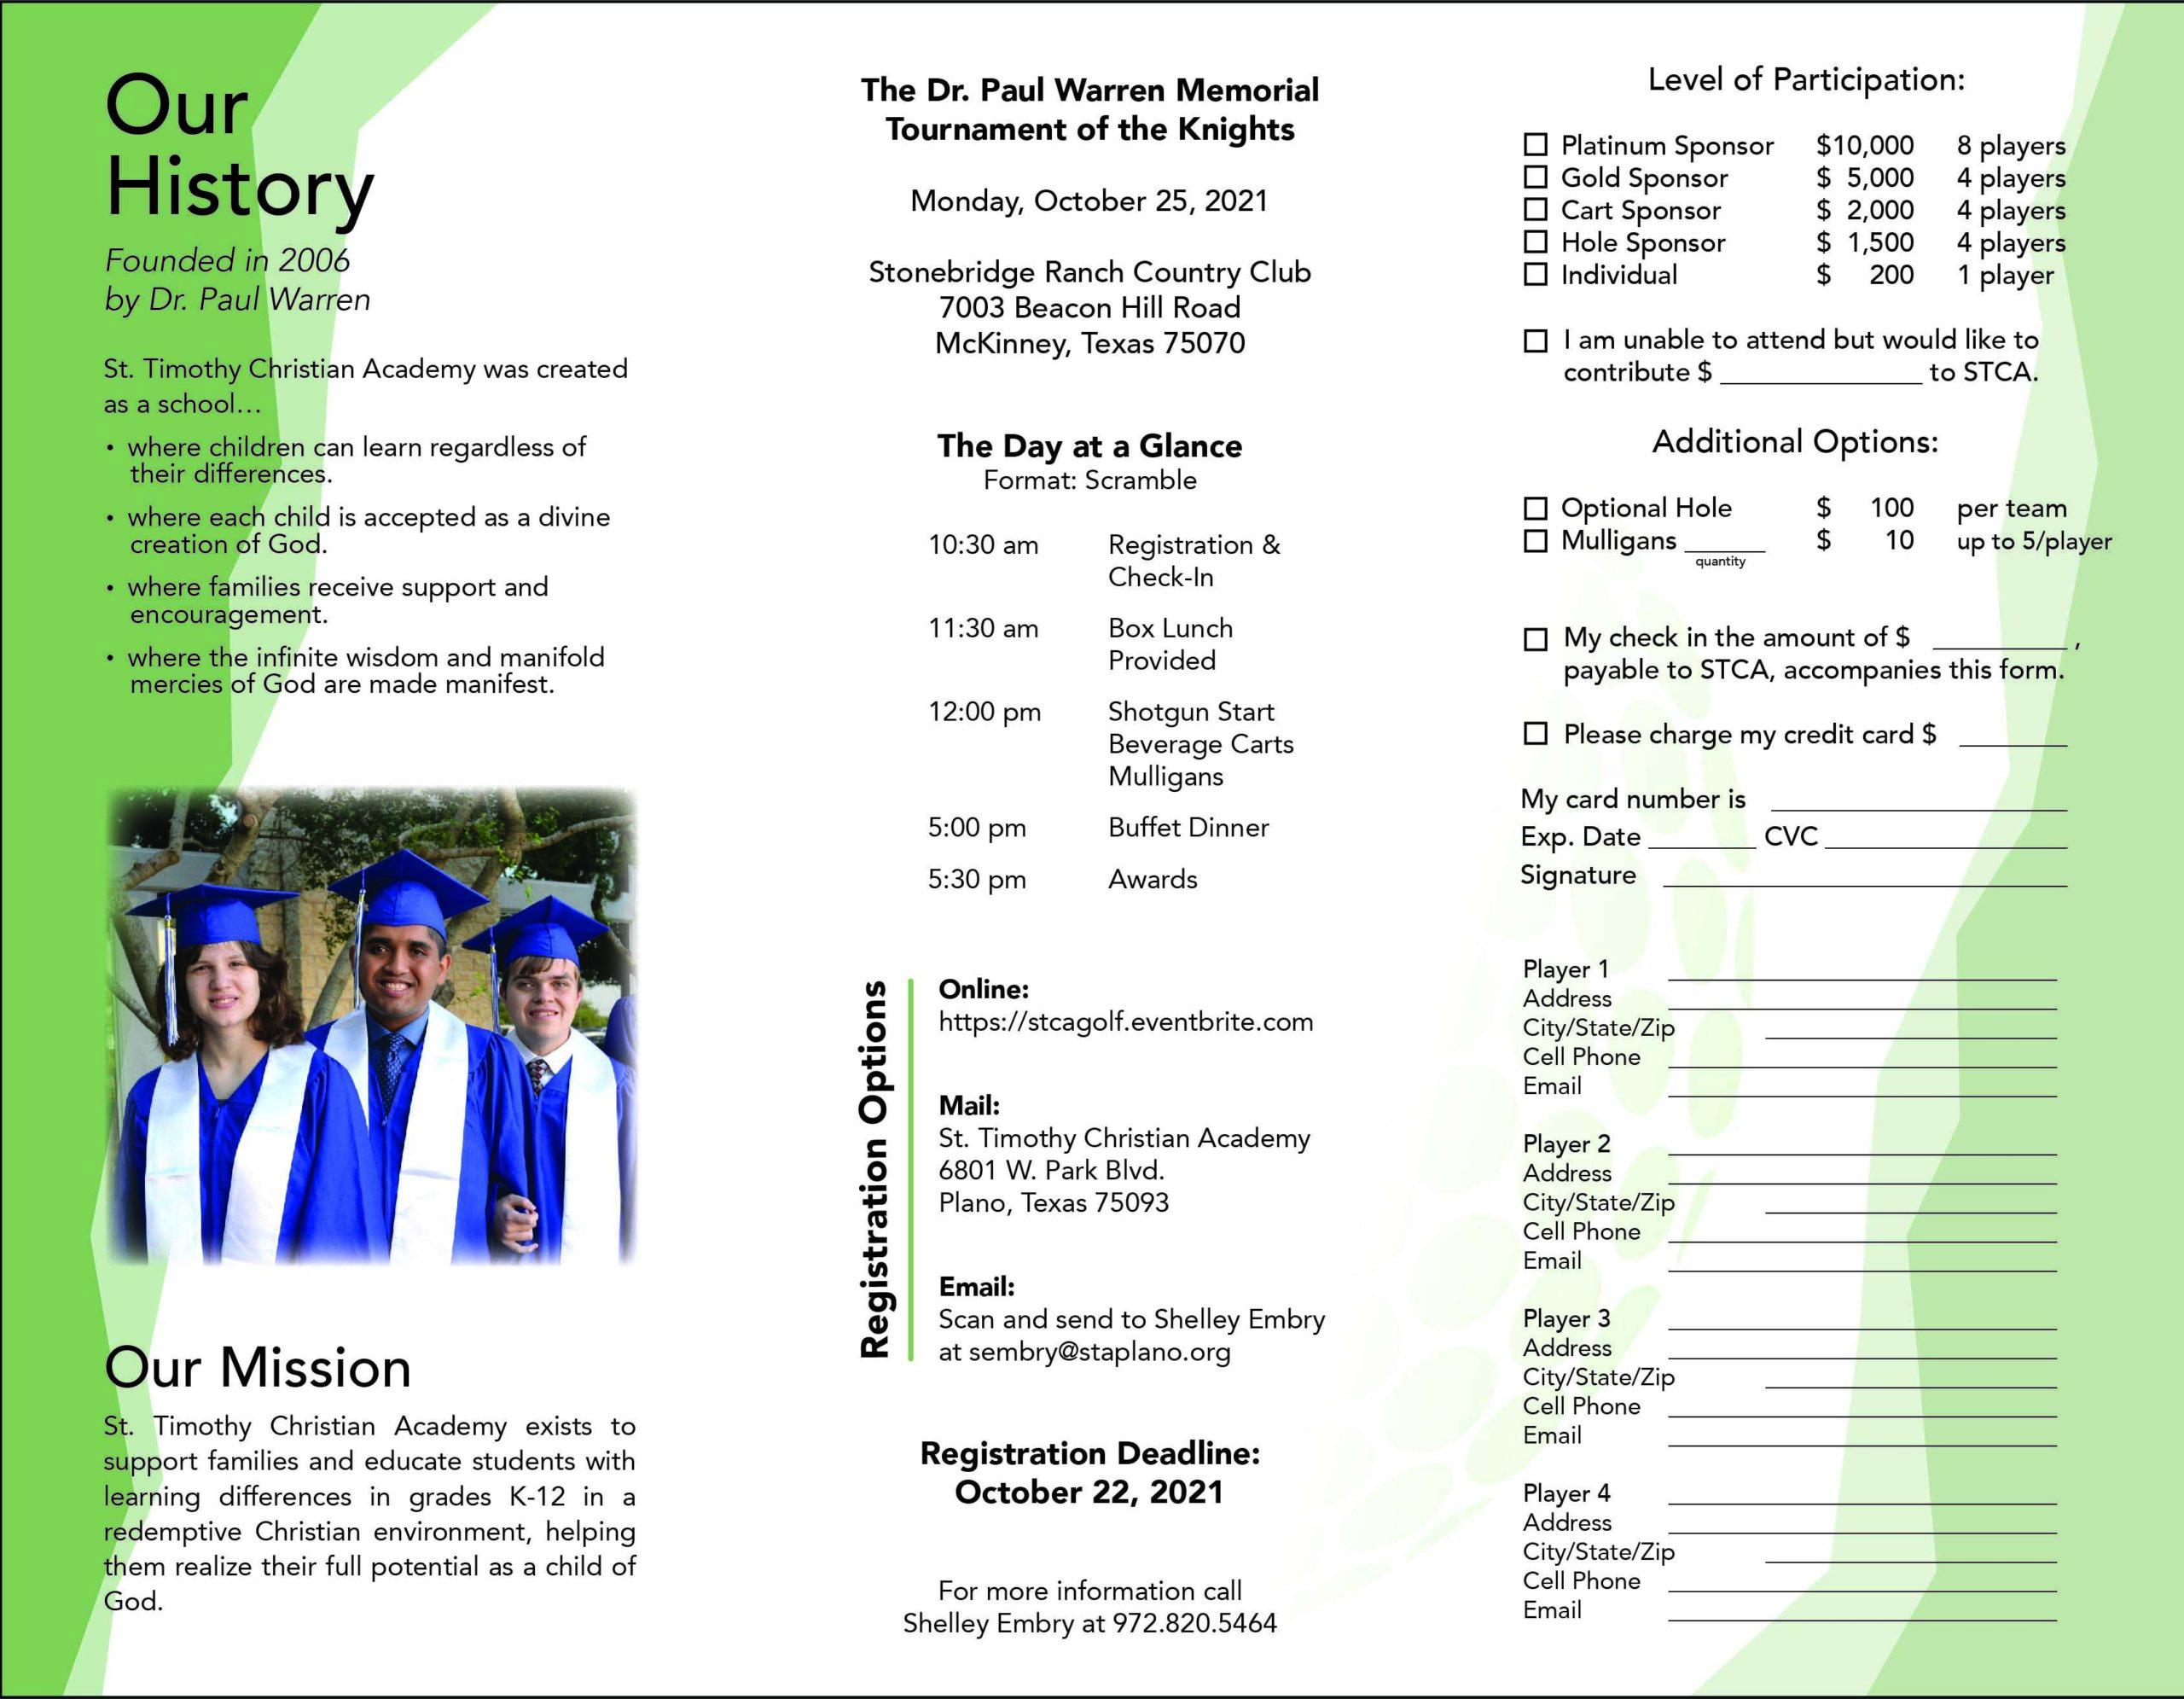 Golf tournament brochure image page 2